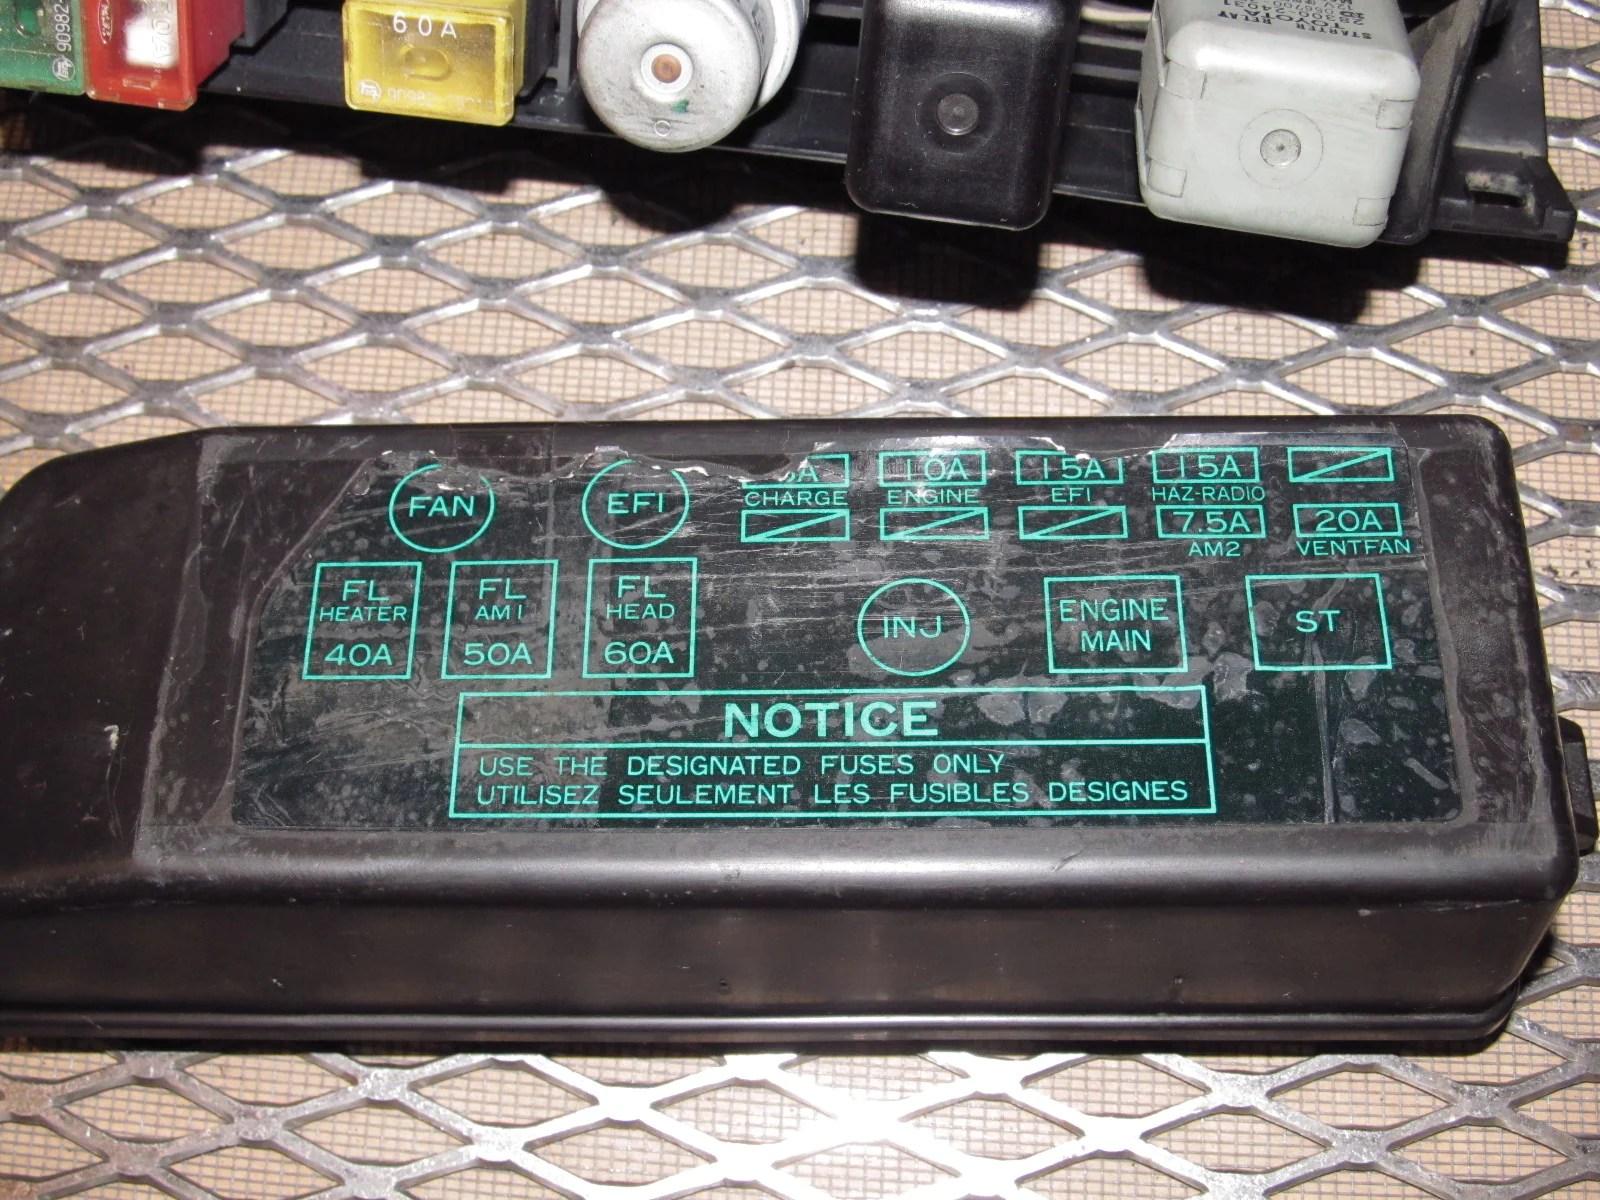 small resolution of 1987 toyota mr2 fuse box diagram wiring diagram advance 1991 toyota mr2 fuse box diagram aw11 mr2 fuse box diagram